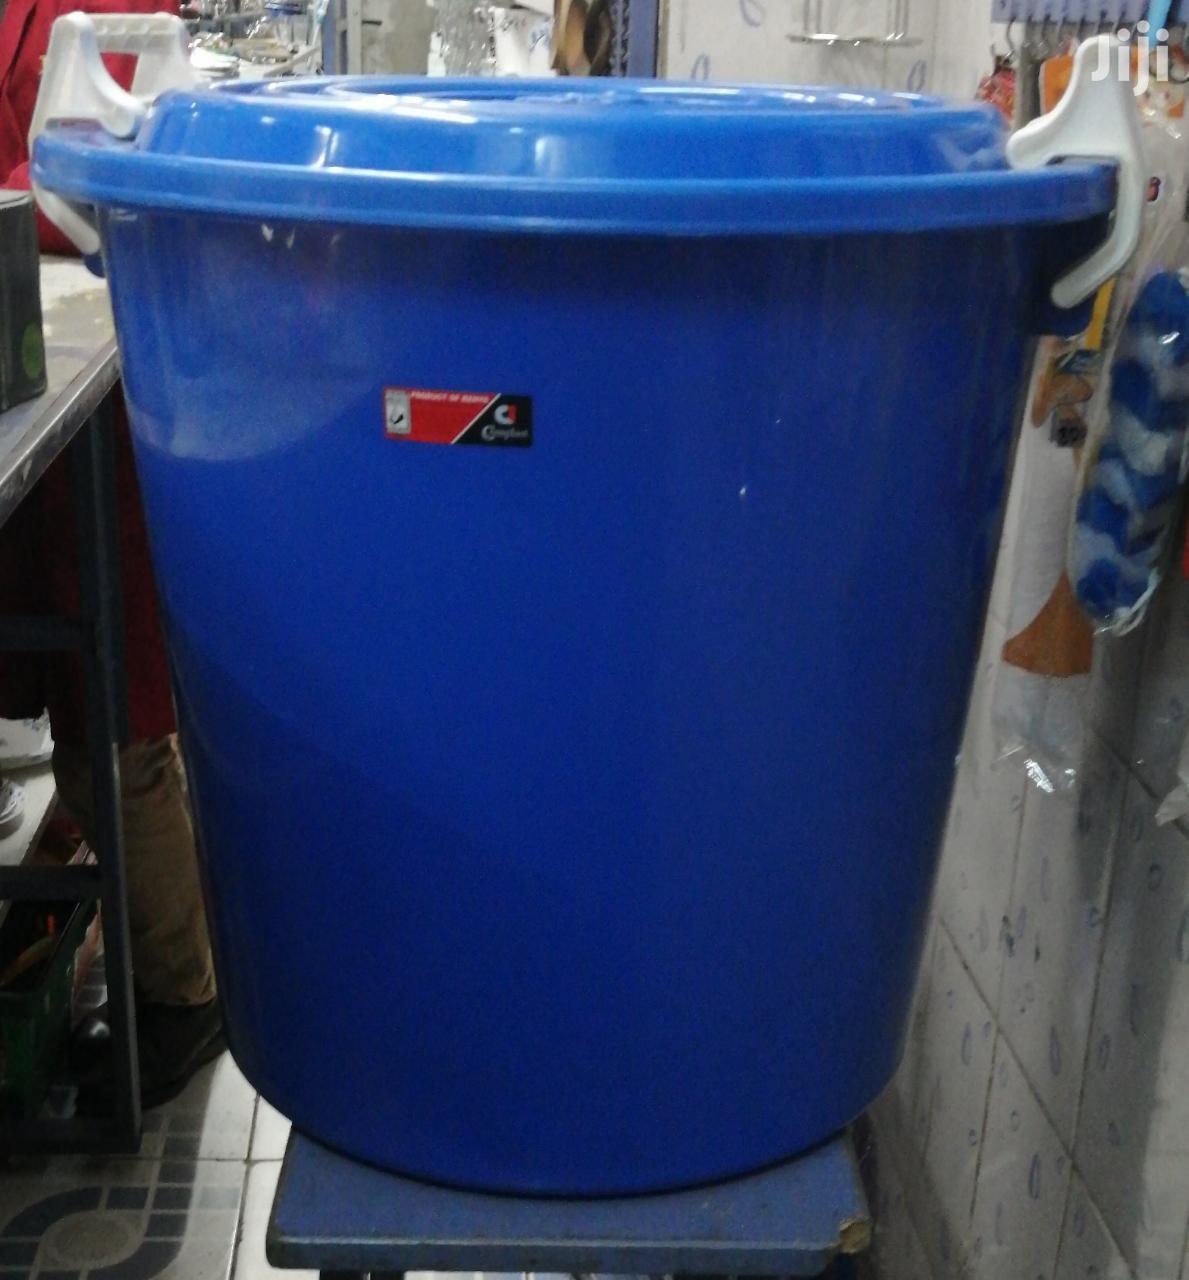 Plastic Dustbin*100 Litres*Blue*Ksh2200